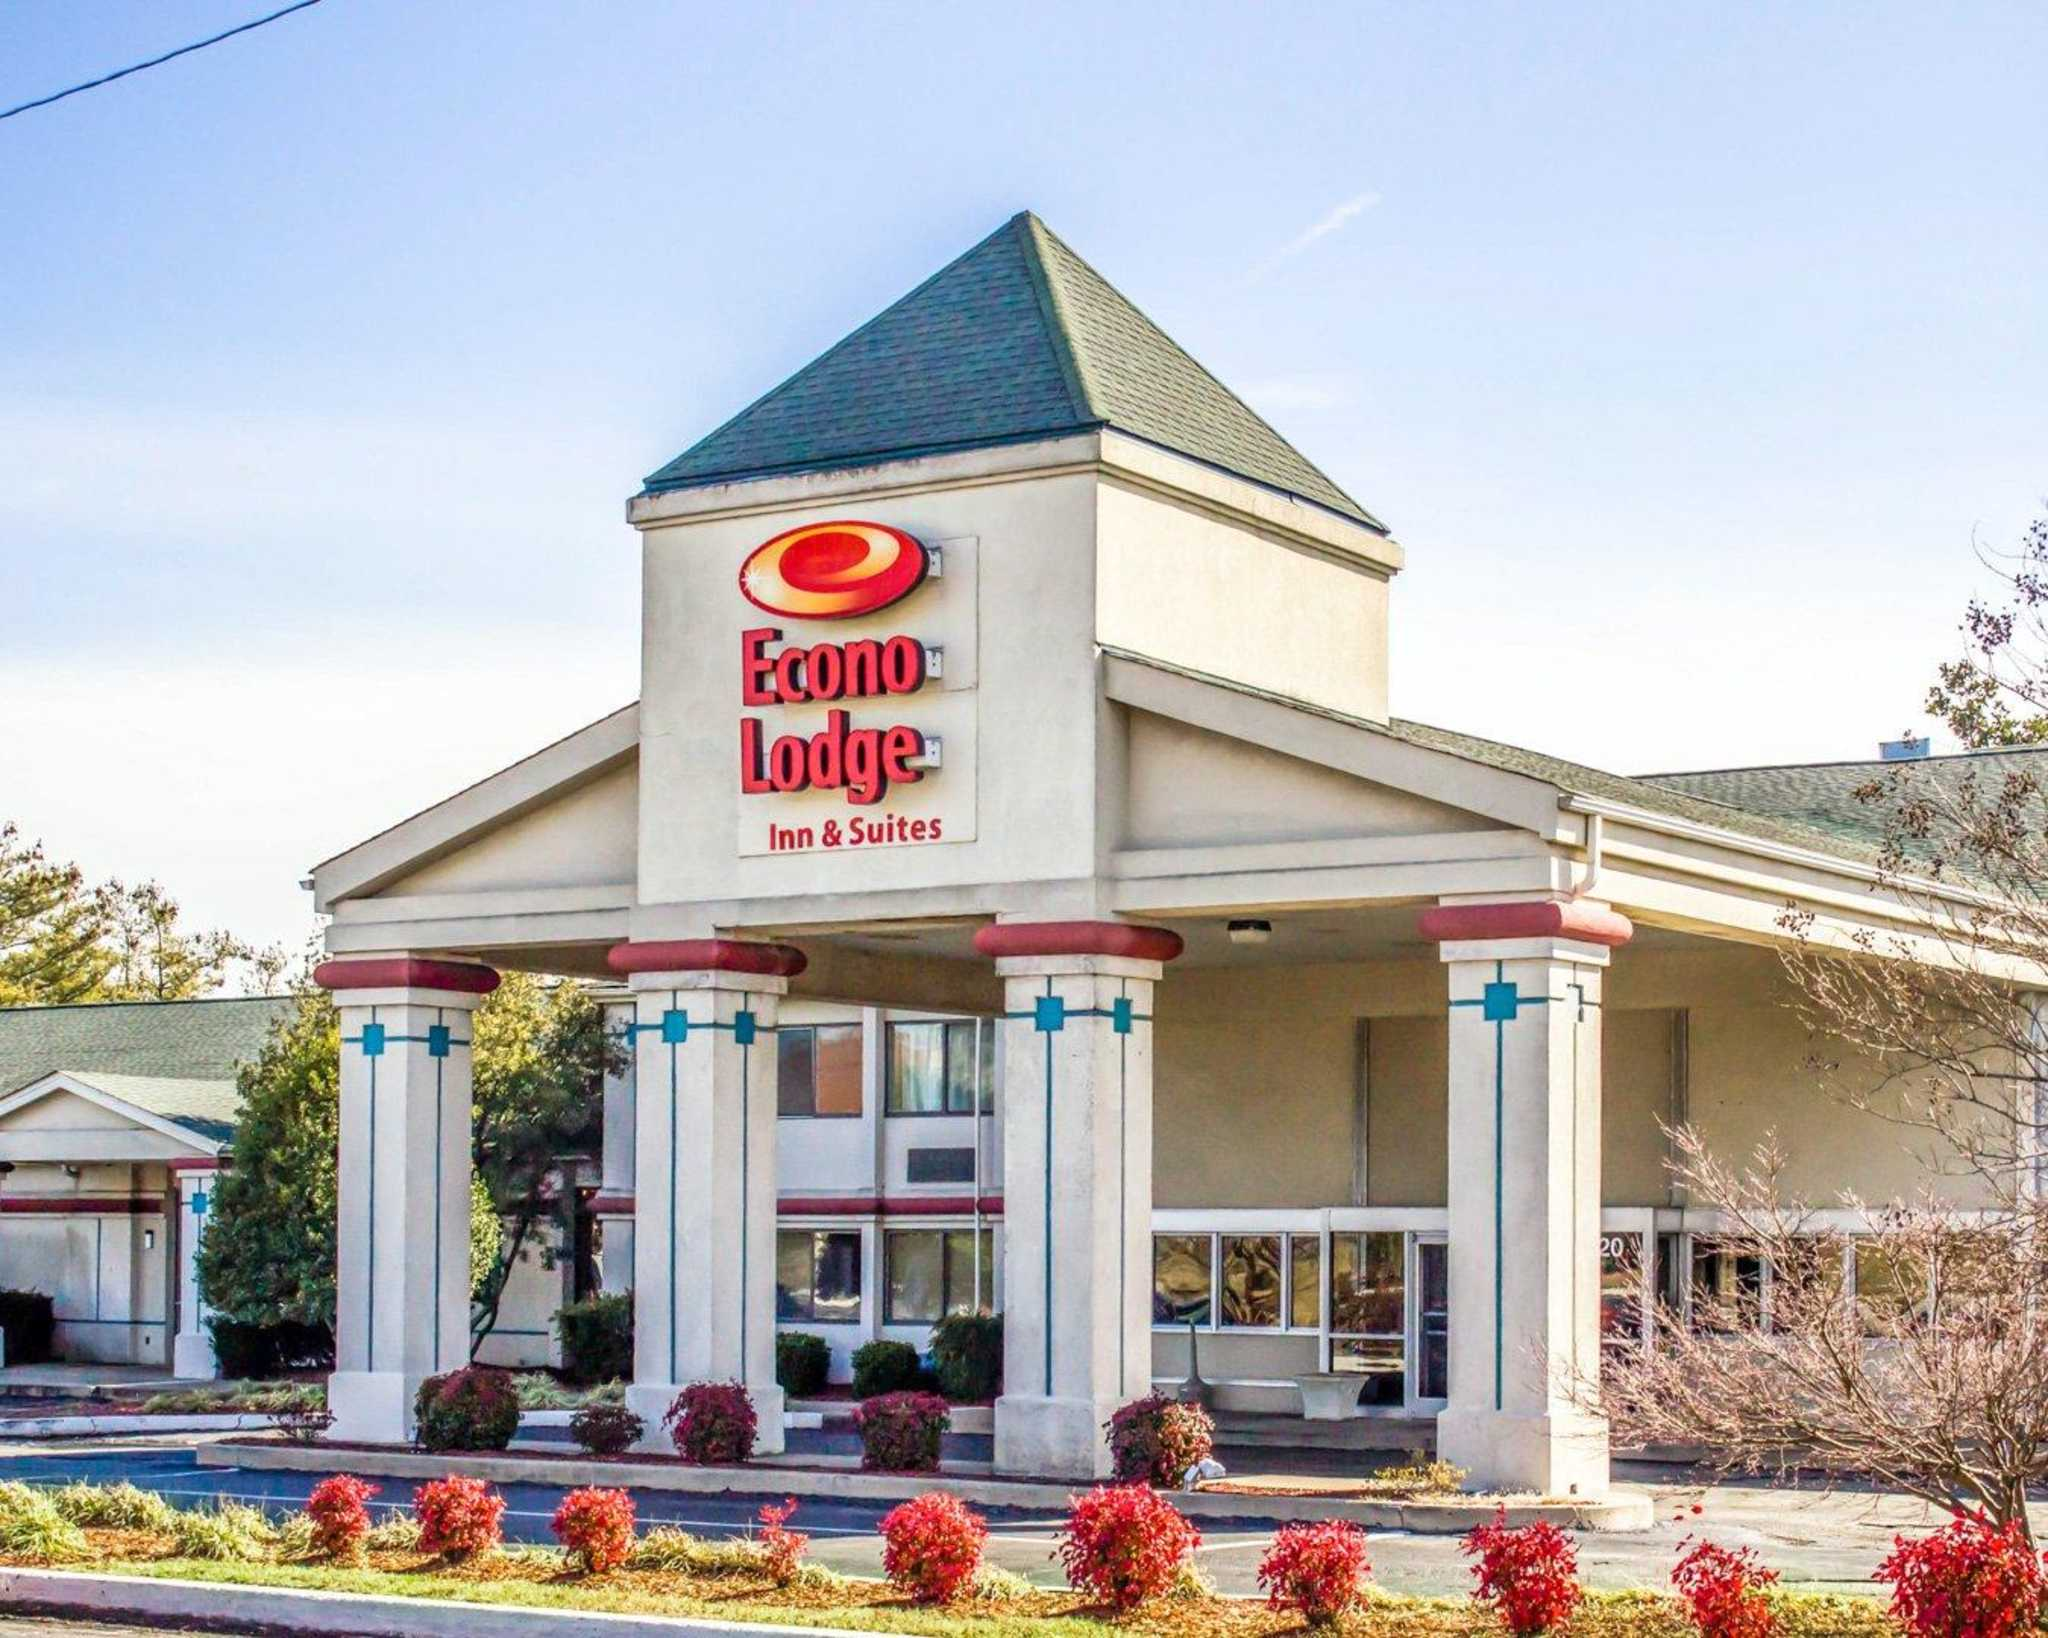 Econo Lodge & Suites image 1